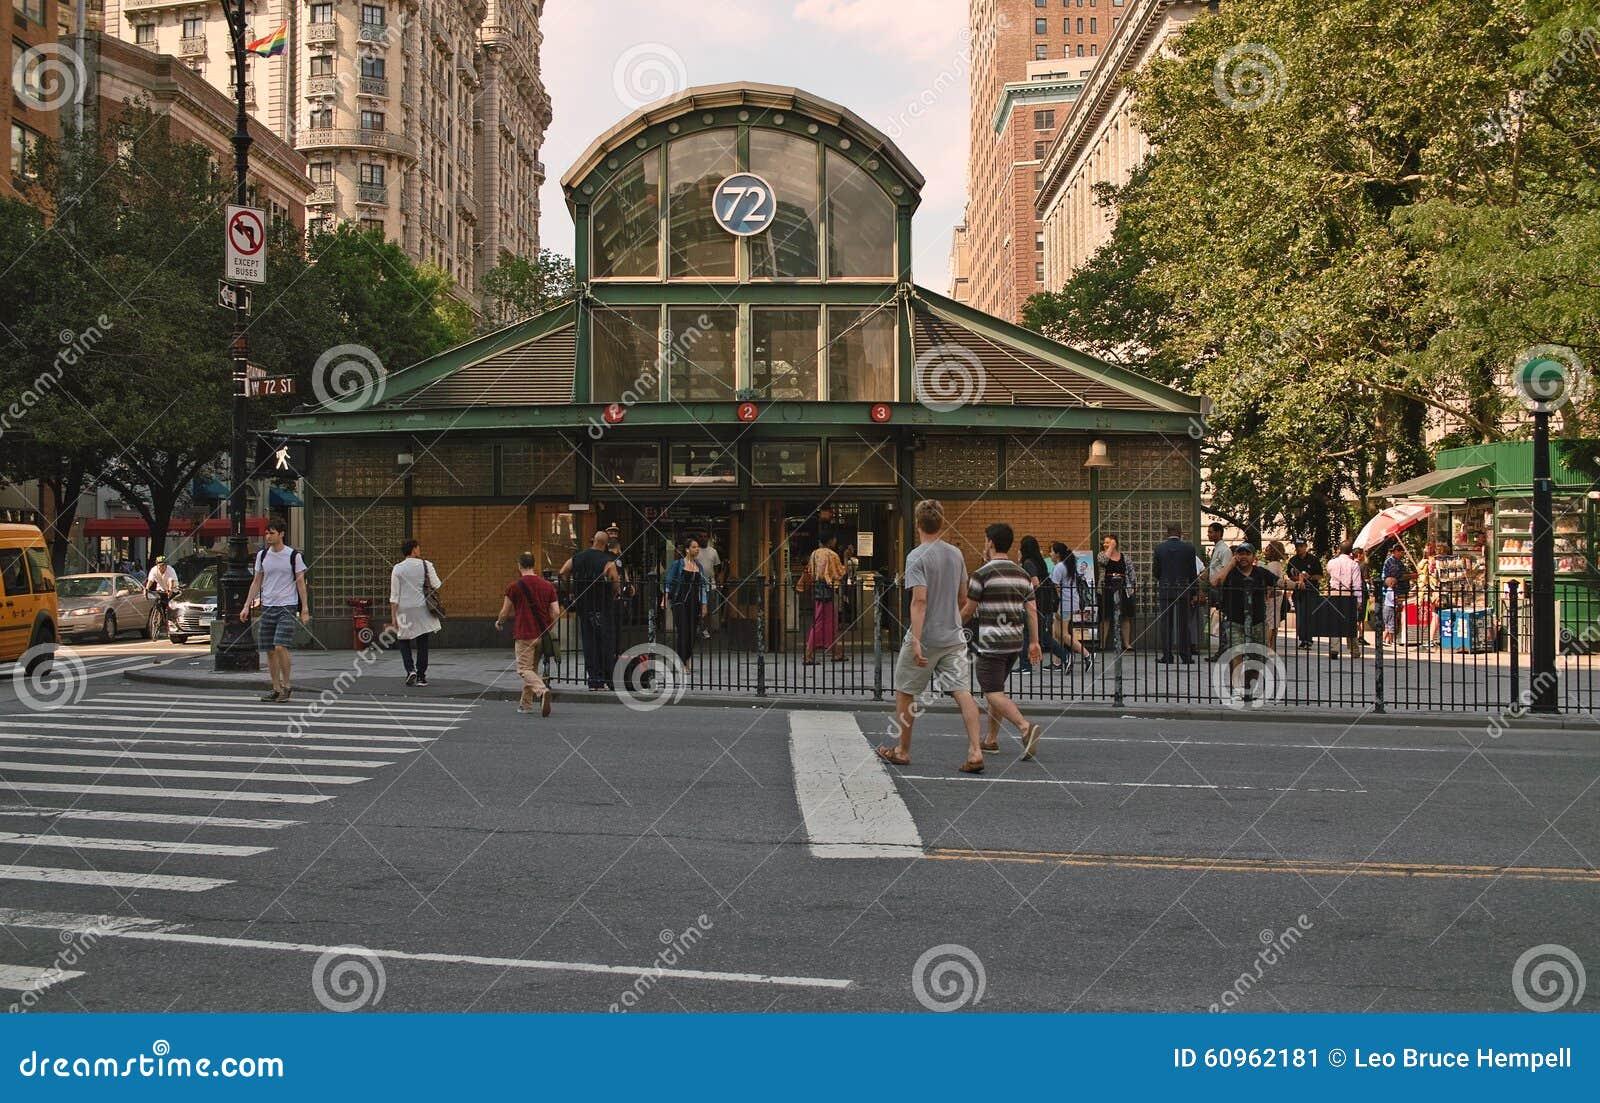 72nd Street Subway Map.72nd Street Broadway Subway Station New York City Editorial Photo